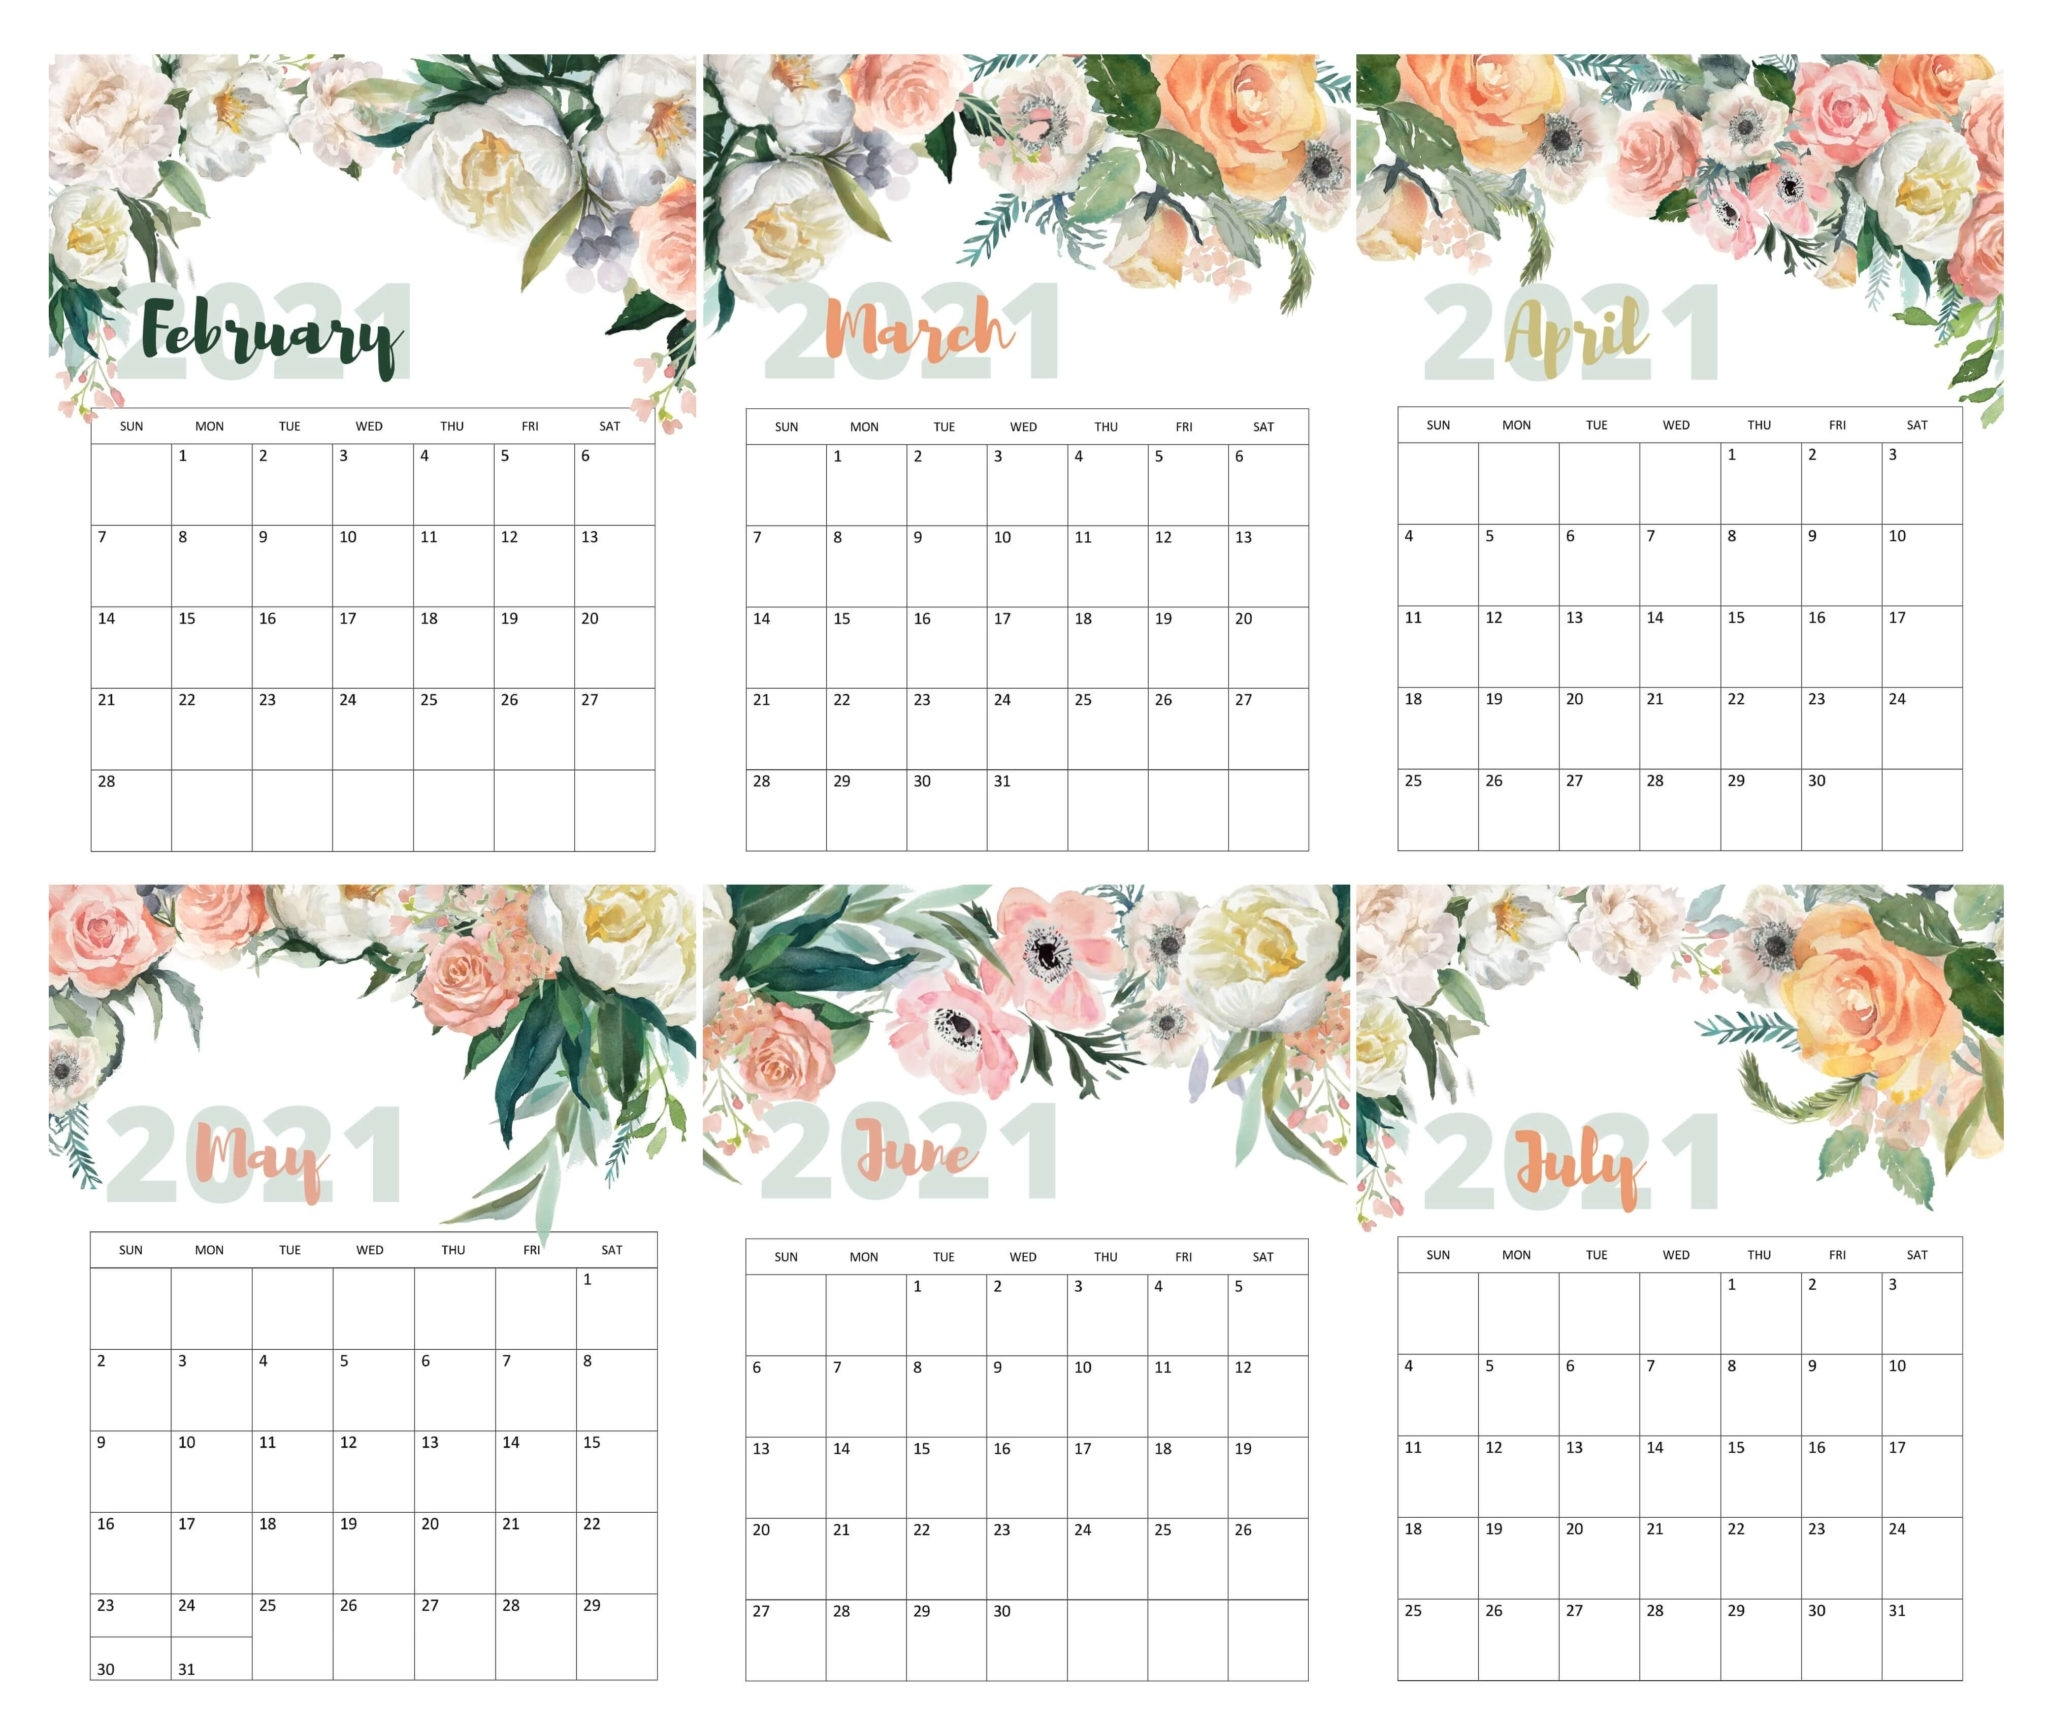 February To July 2021 Calendar Templates - Time Management Tools February To July 2021 Calendar February To July 2021 Calendar